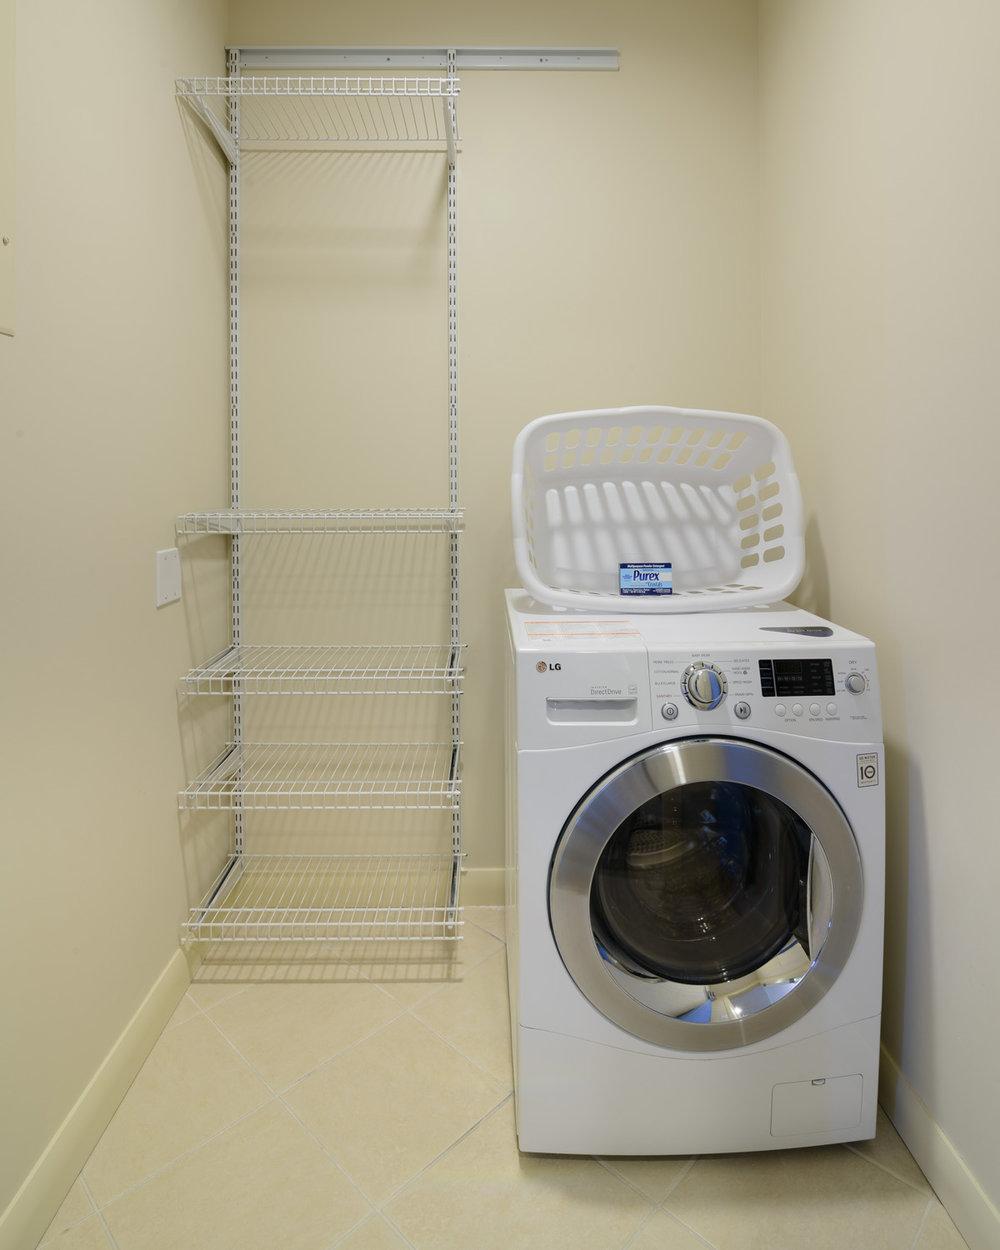 Apartment Hotel Washer Dryer